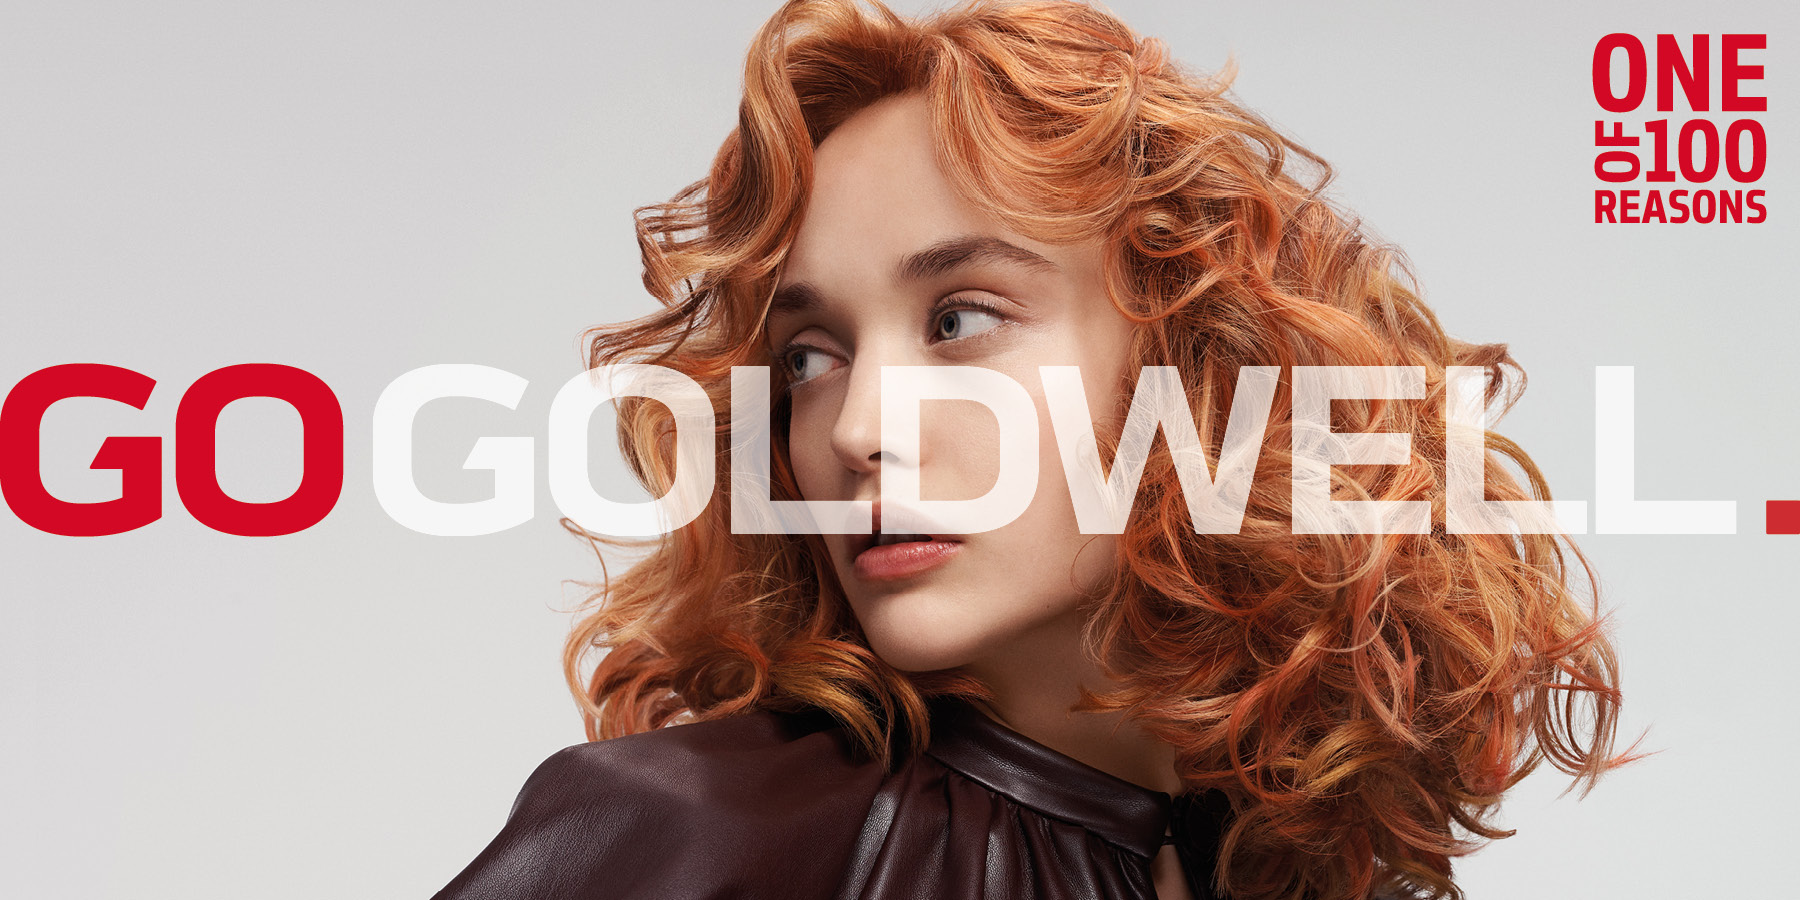 GW-MB-GOGOLDWELL-Home-Fullscreen-Teaser-1